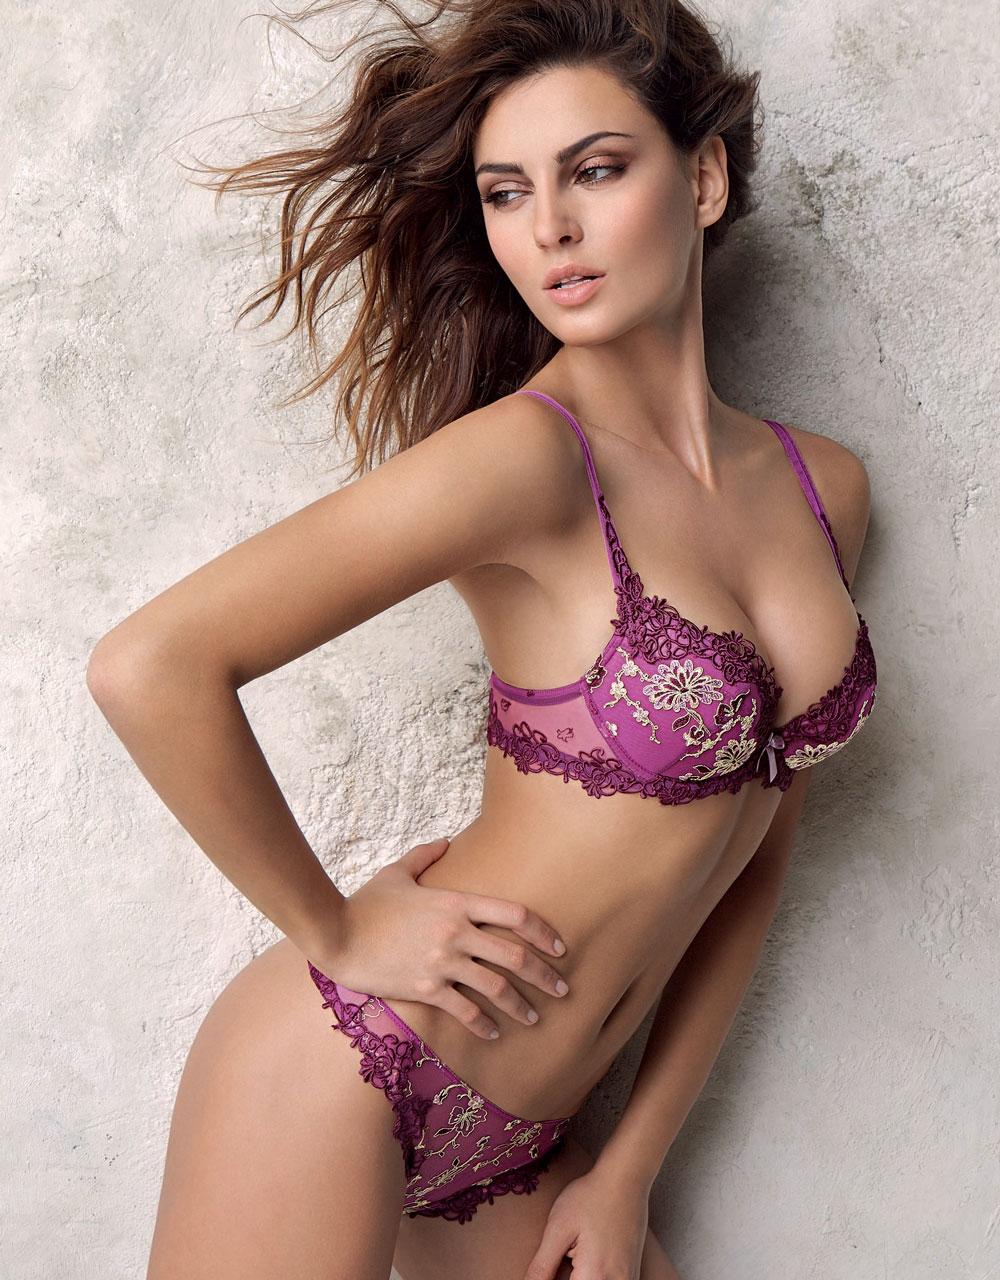 Romanian girl sucks XXX images